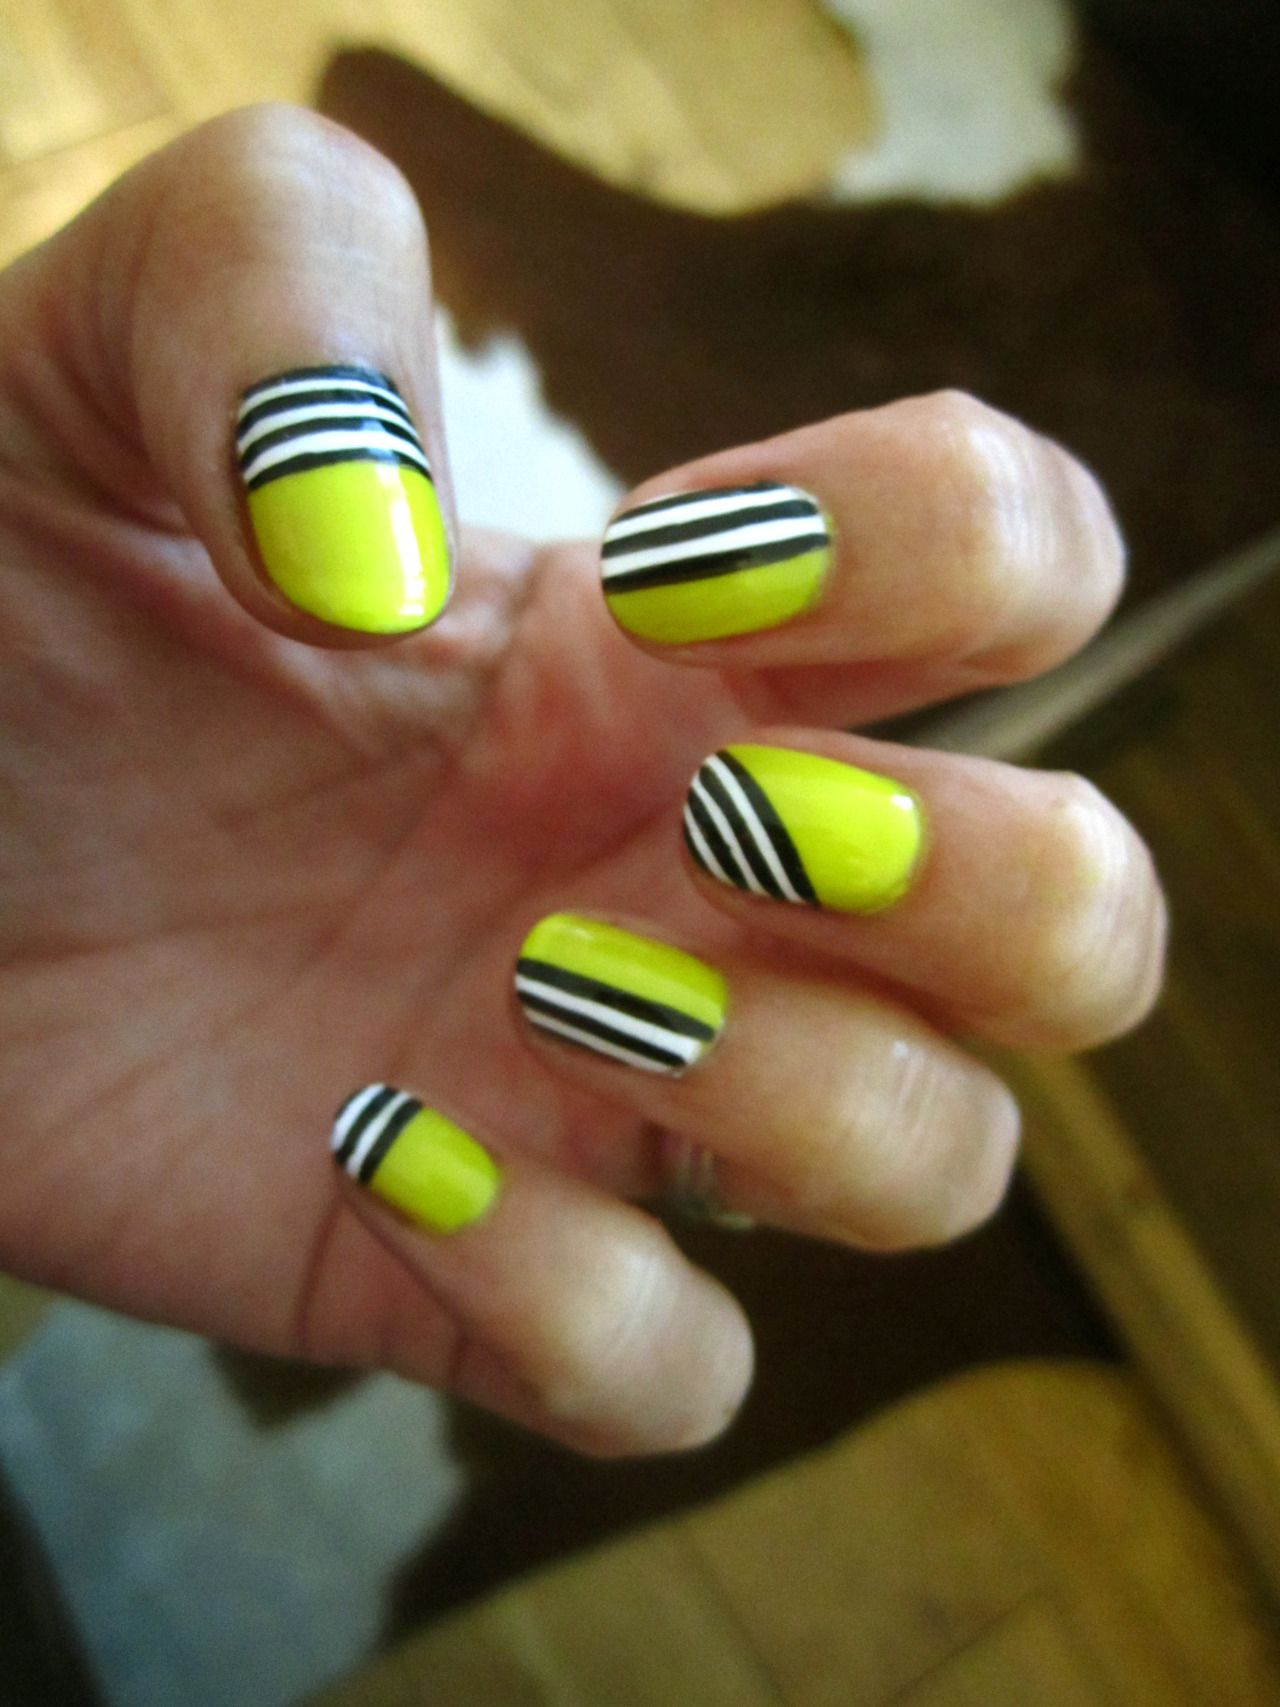 Neon yellow w black and white stripes nails nails pinterest